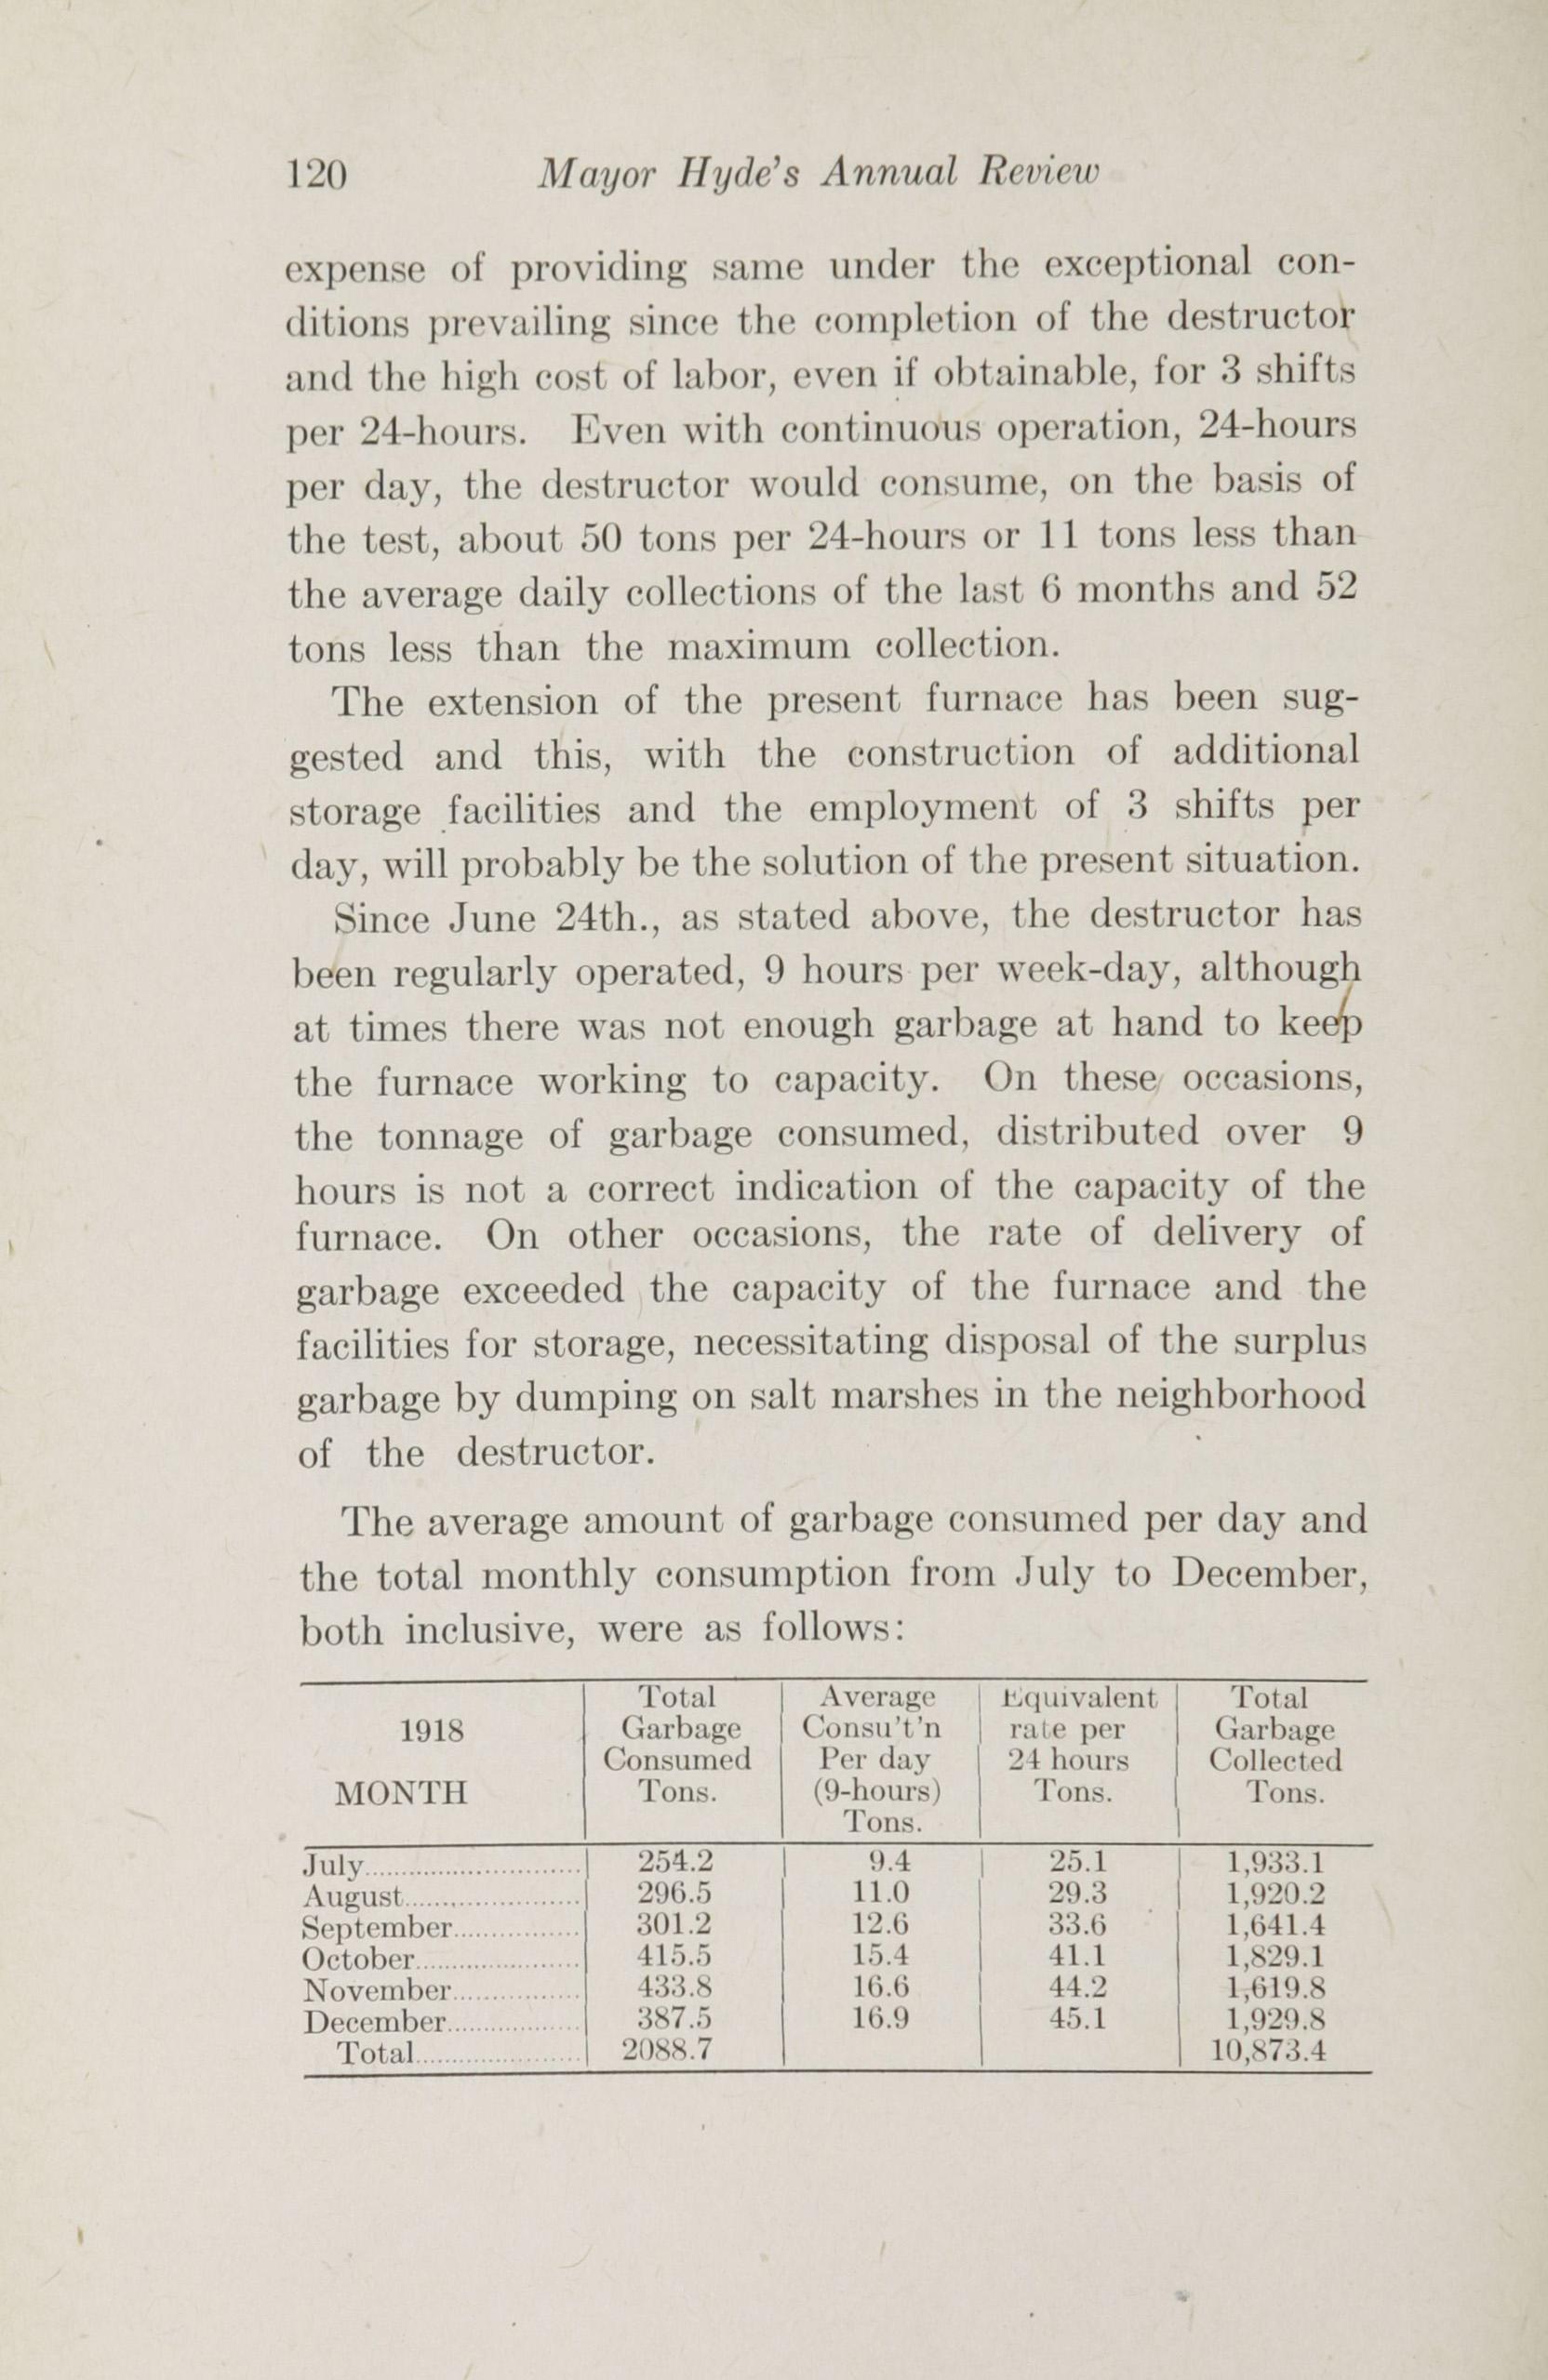 Charleston Yearbook, 1918, page 120